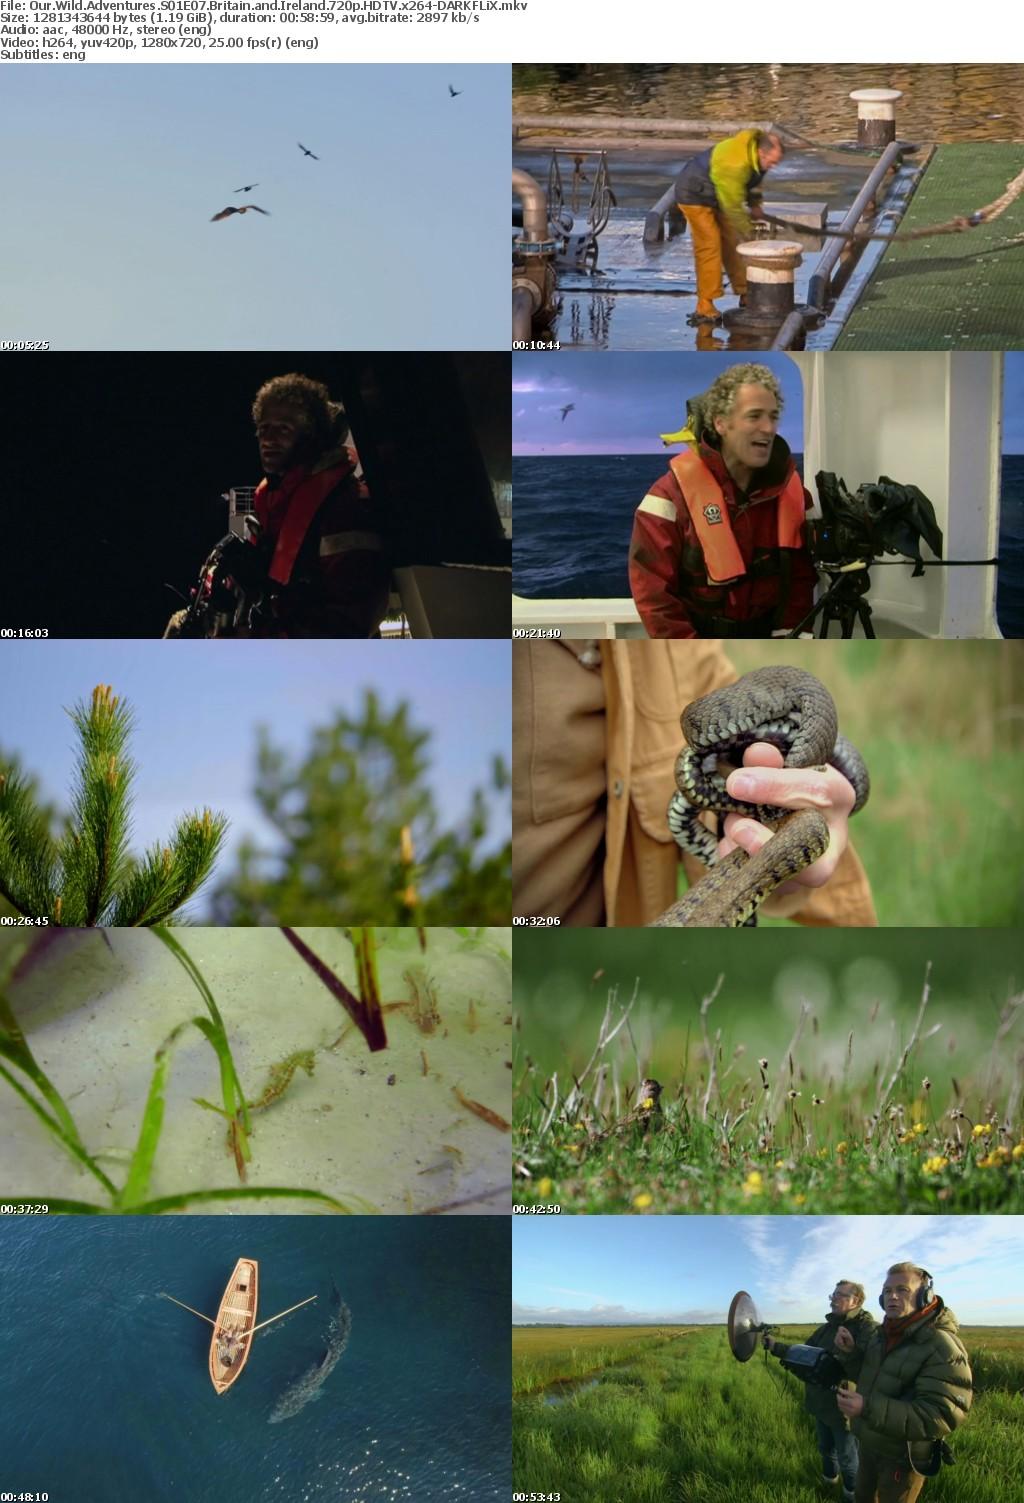 Our Wild Adventures S01E07 Britain and Ireland 720p HDTV x264-DARKFLiX